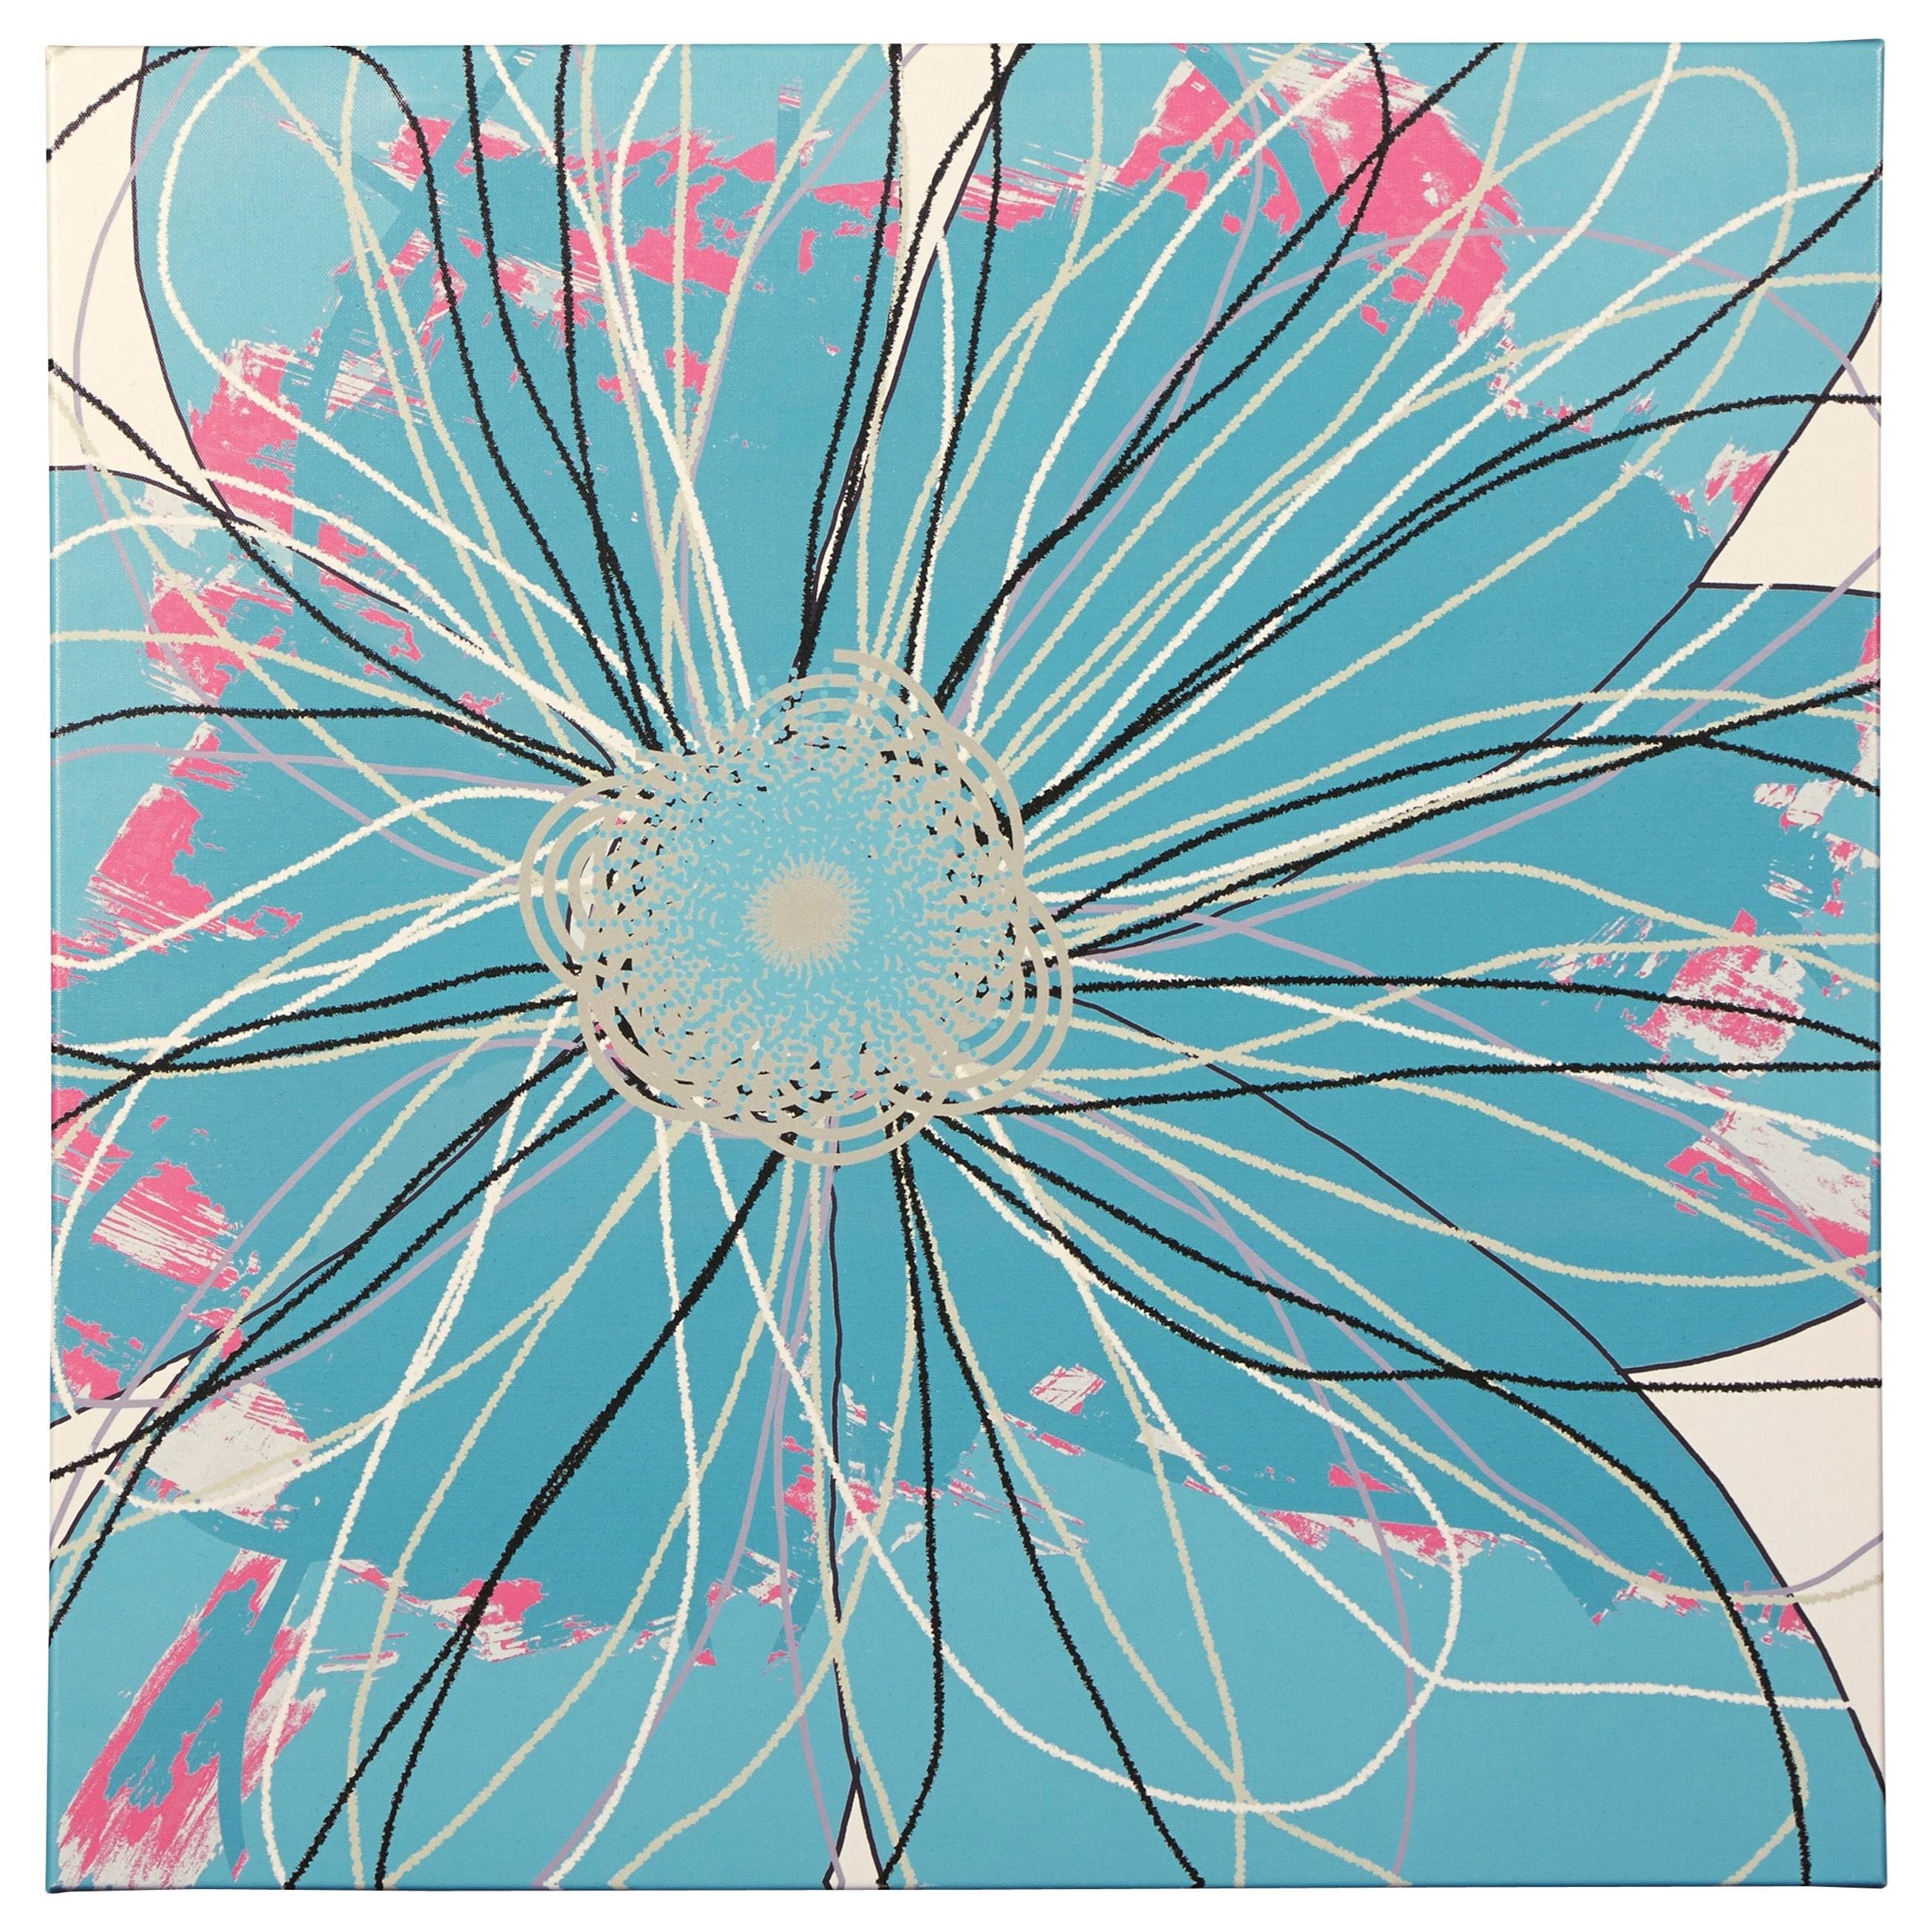 Signature Design by Ashley Wall Art Berdina Multi Wall Art - Item Number: A8000174